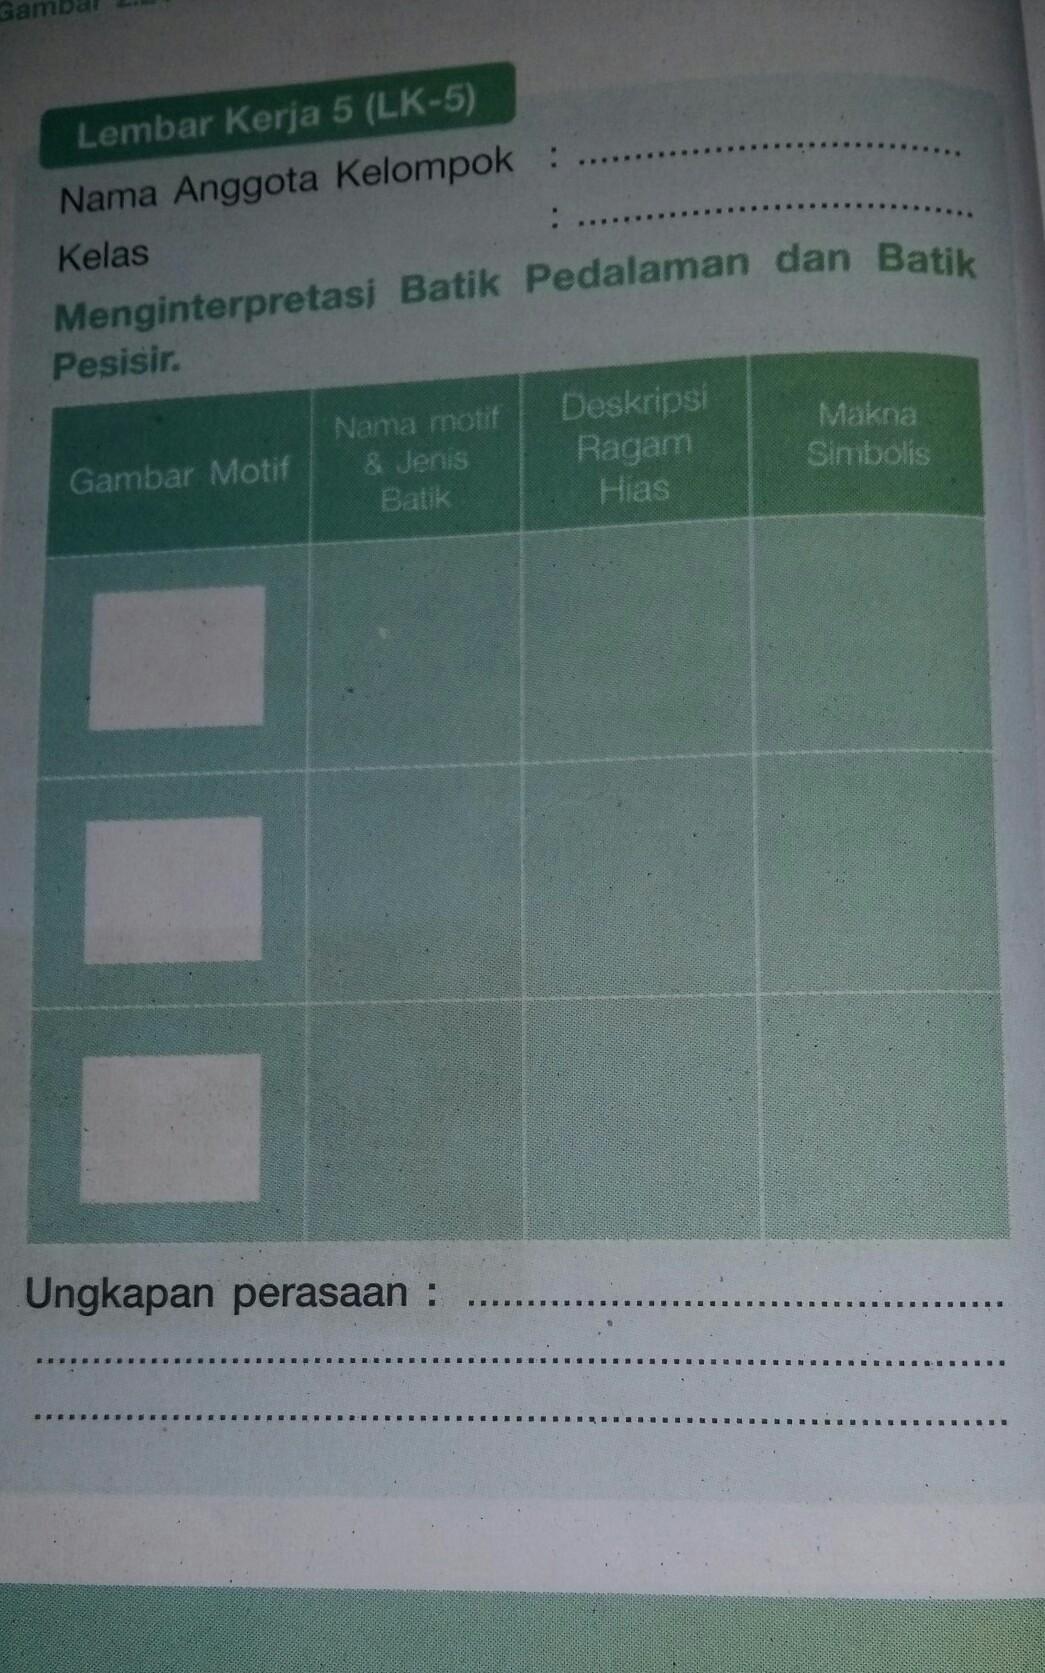 Menginterpretasi Batik Pedalaman Dan Batik Pesisir : menginterpretasi, batik, pedalaman, pesisir, Tolong, Jawabkan, Beserta, Gambar, Motif, Brainly.co.id